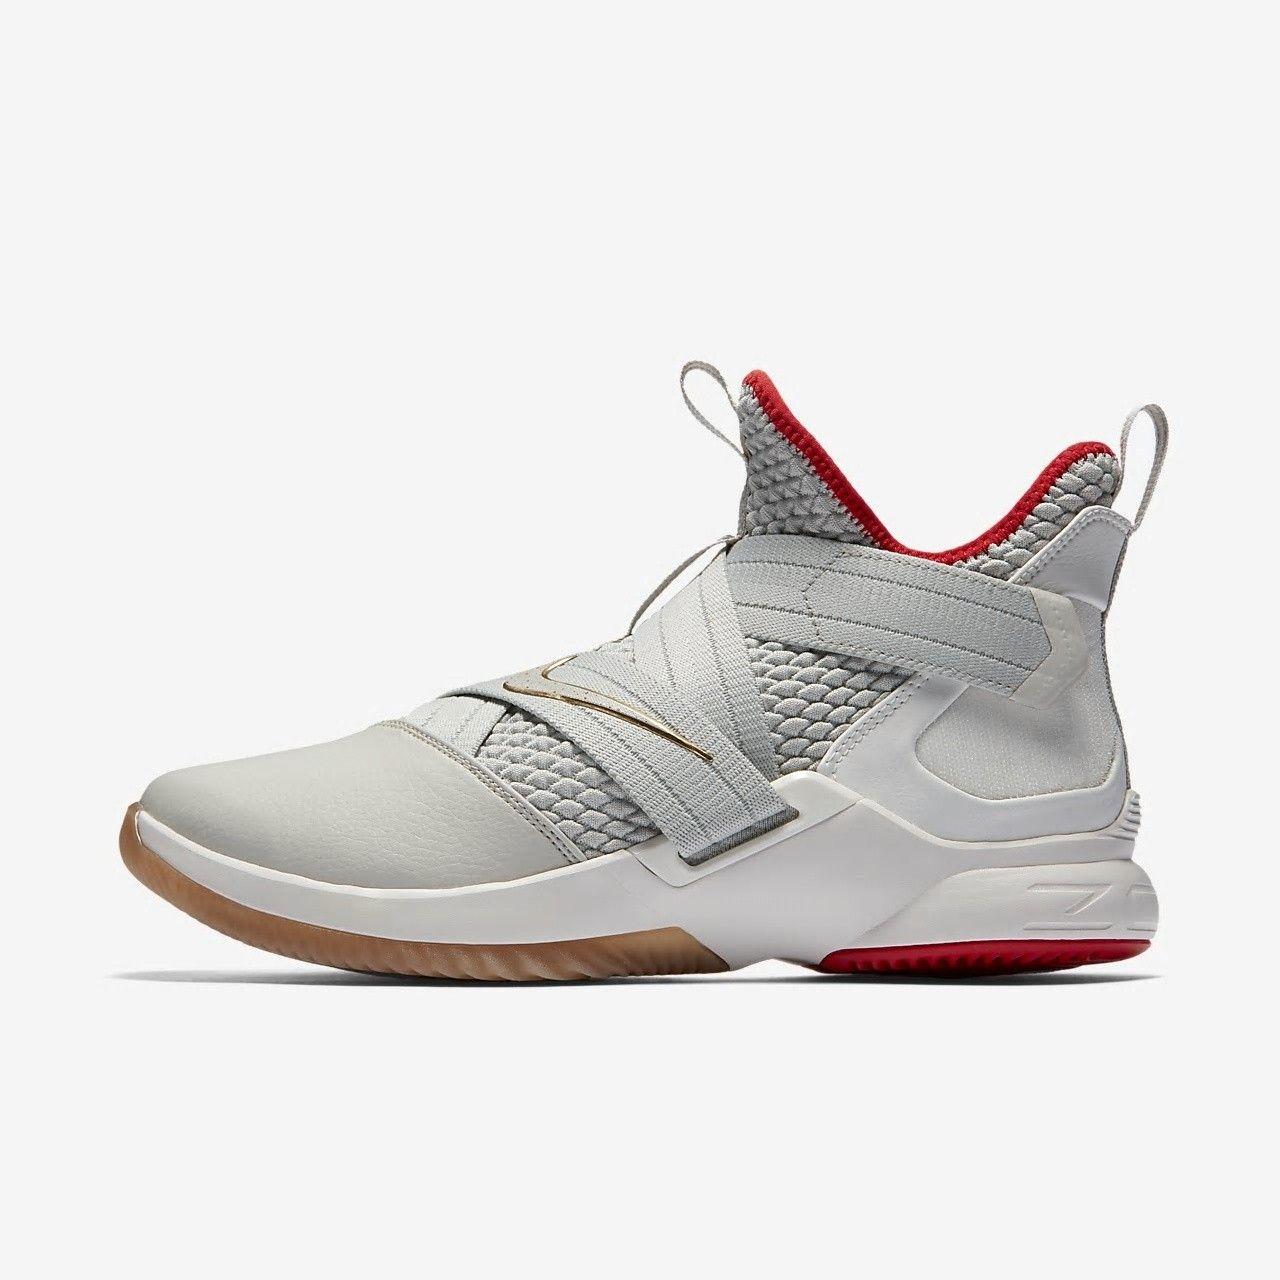 Nike LeBron Soldier XII Men s Light Bone  nike  nikemens  nikeshoes   nikelebron 85bae8d15